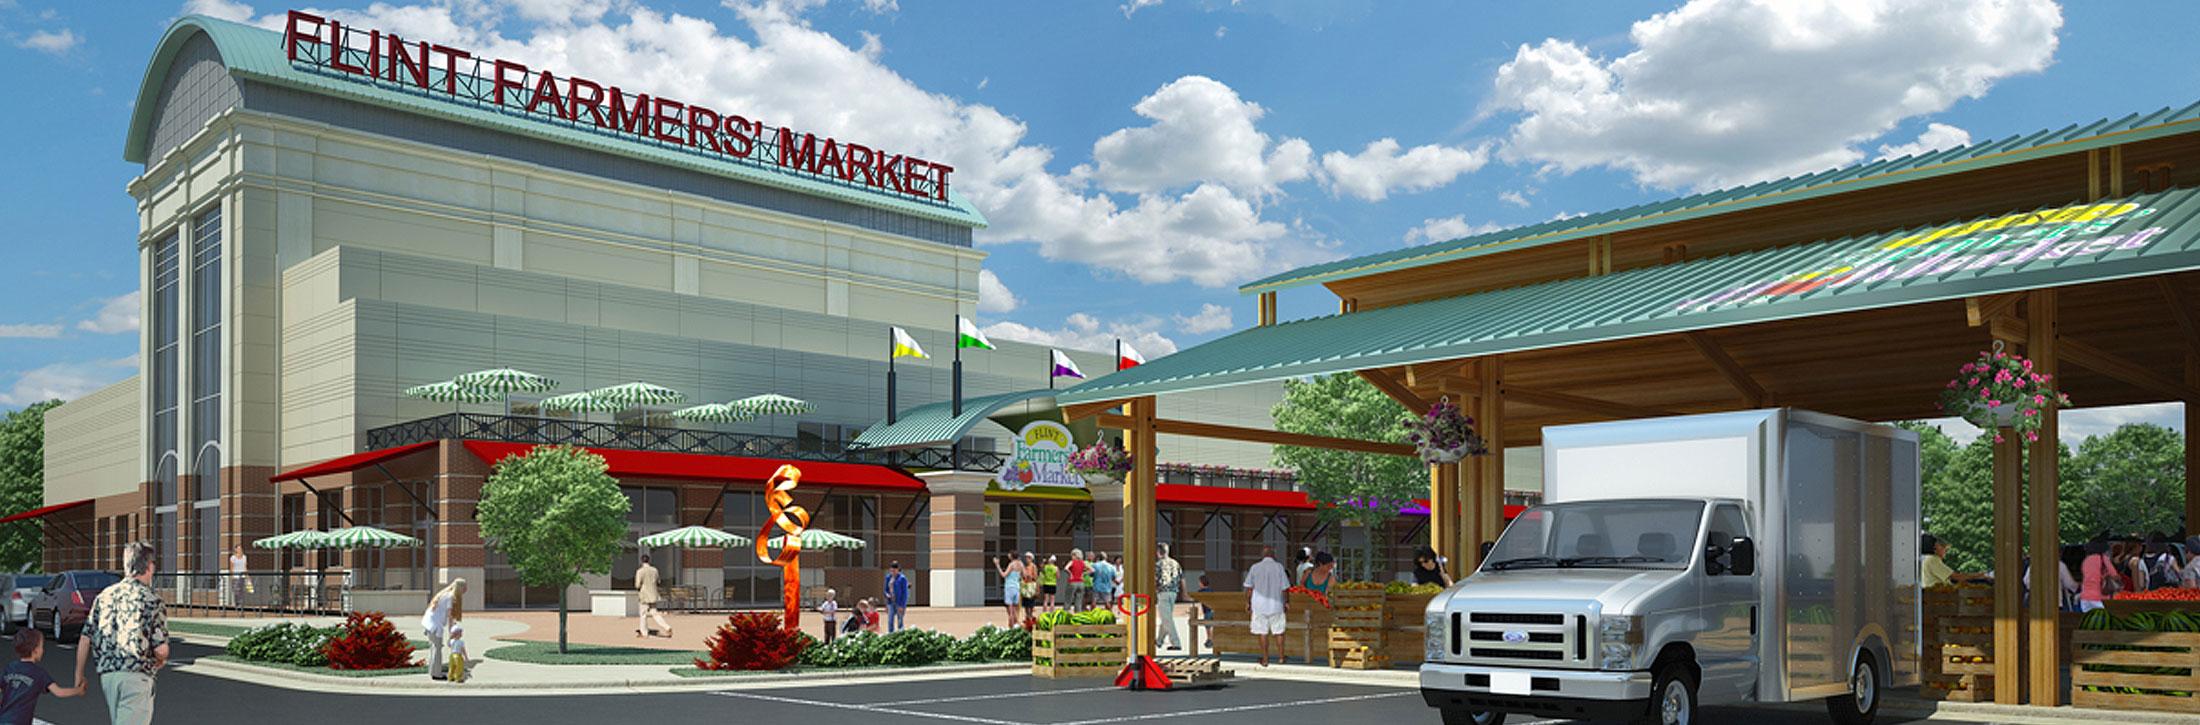 Flint Farmers' Market Announces Plans for Grand Opening June 21, 2014